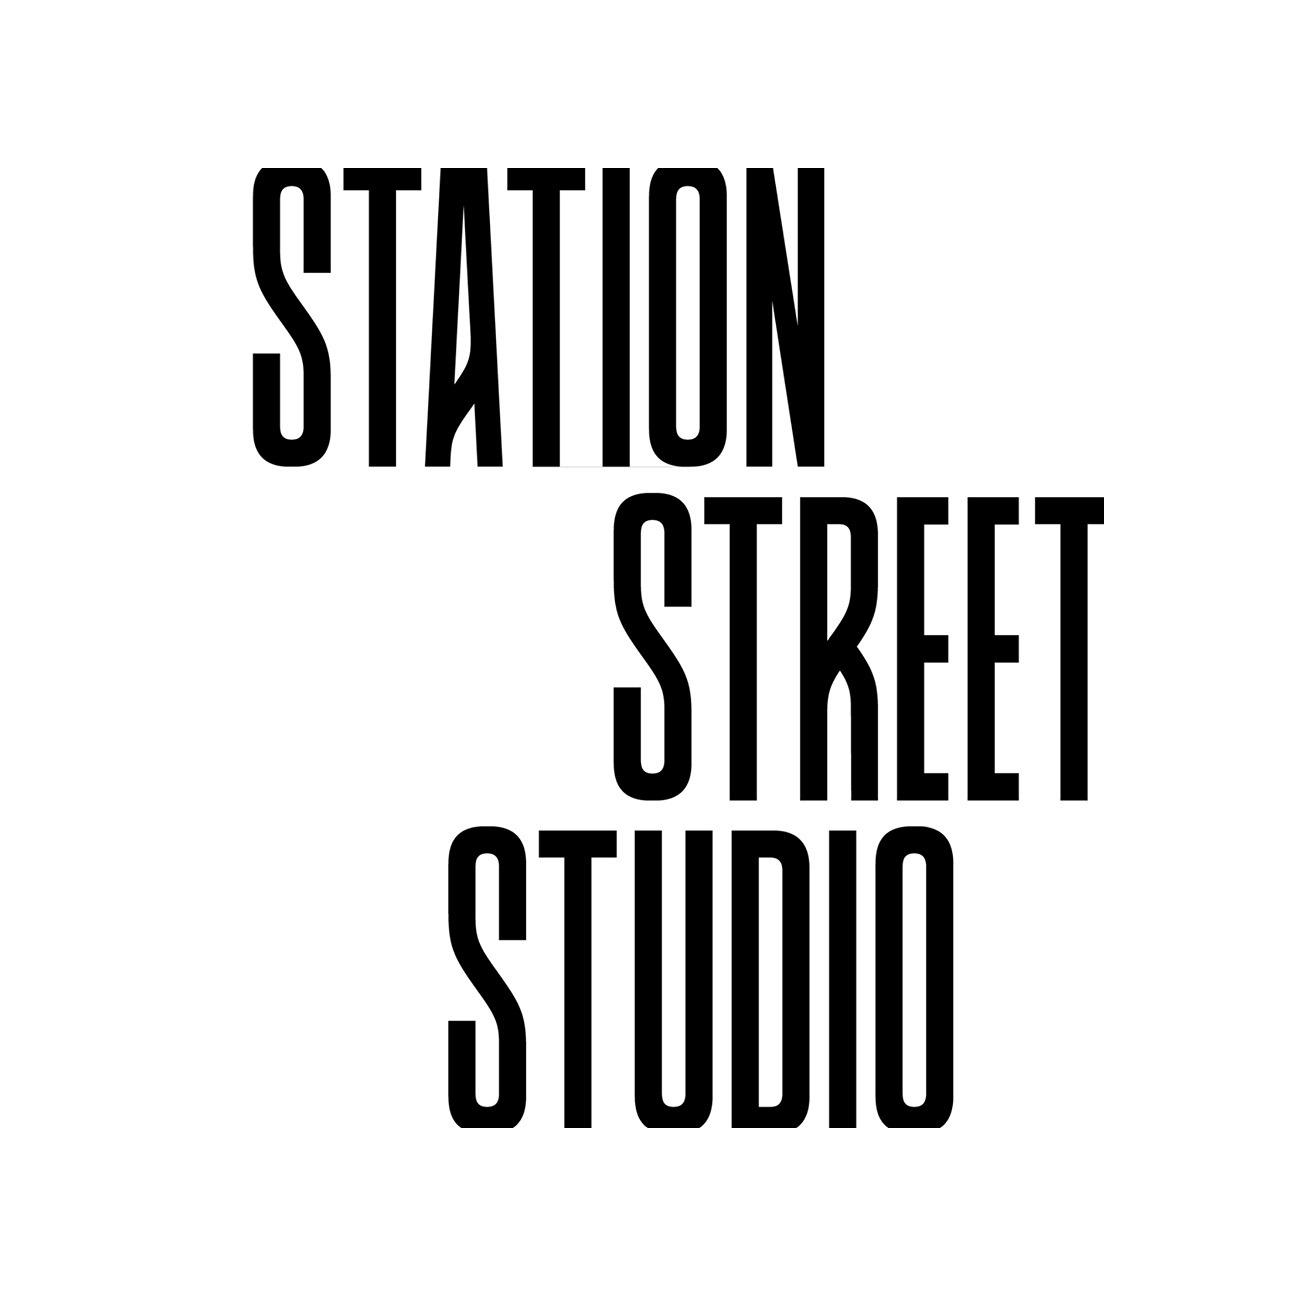 Station Street Studio